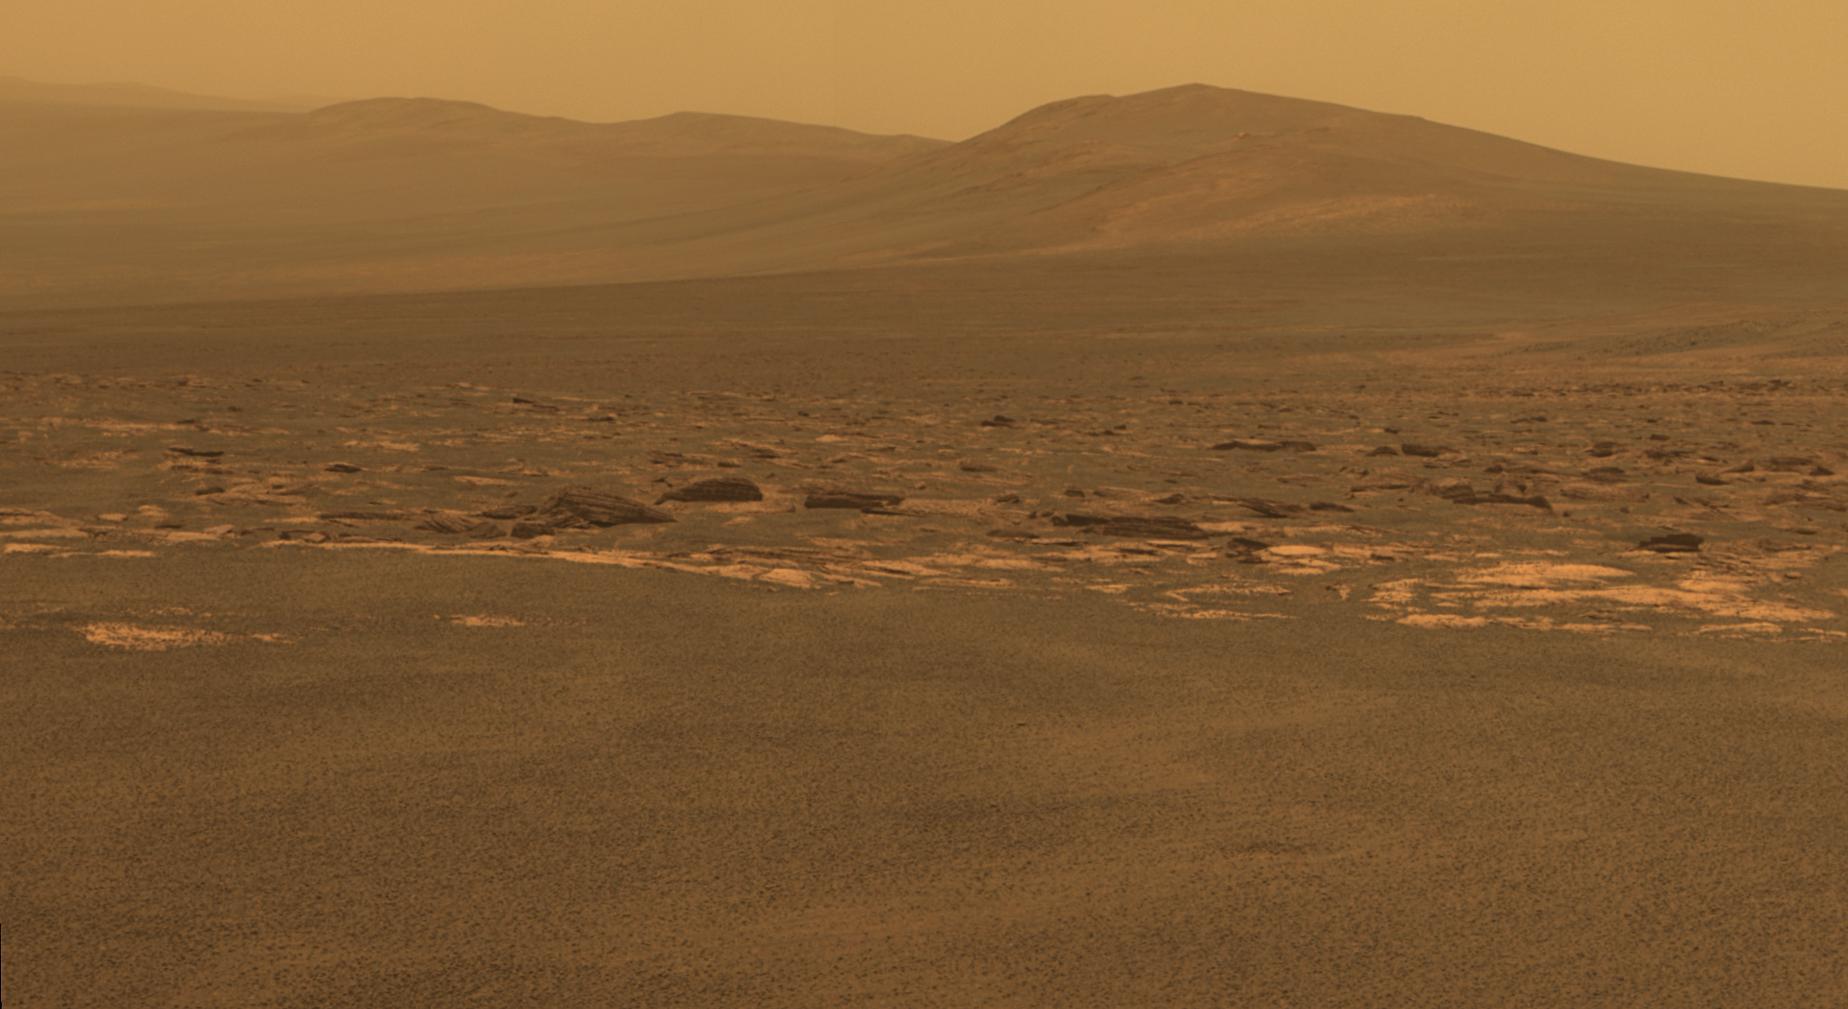 Západní okraj kráteru Endeavour na Marsu na fotografii z vozítka Opportunity